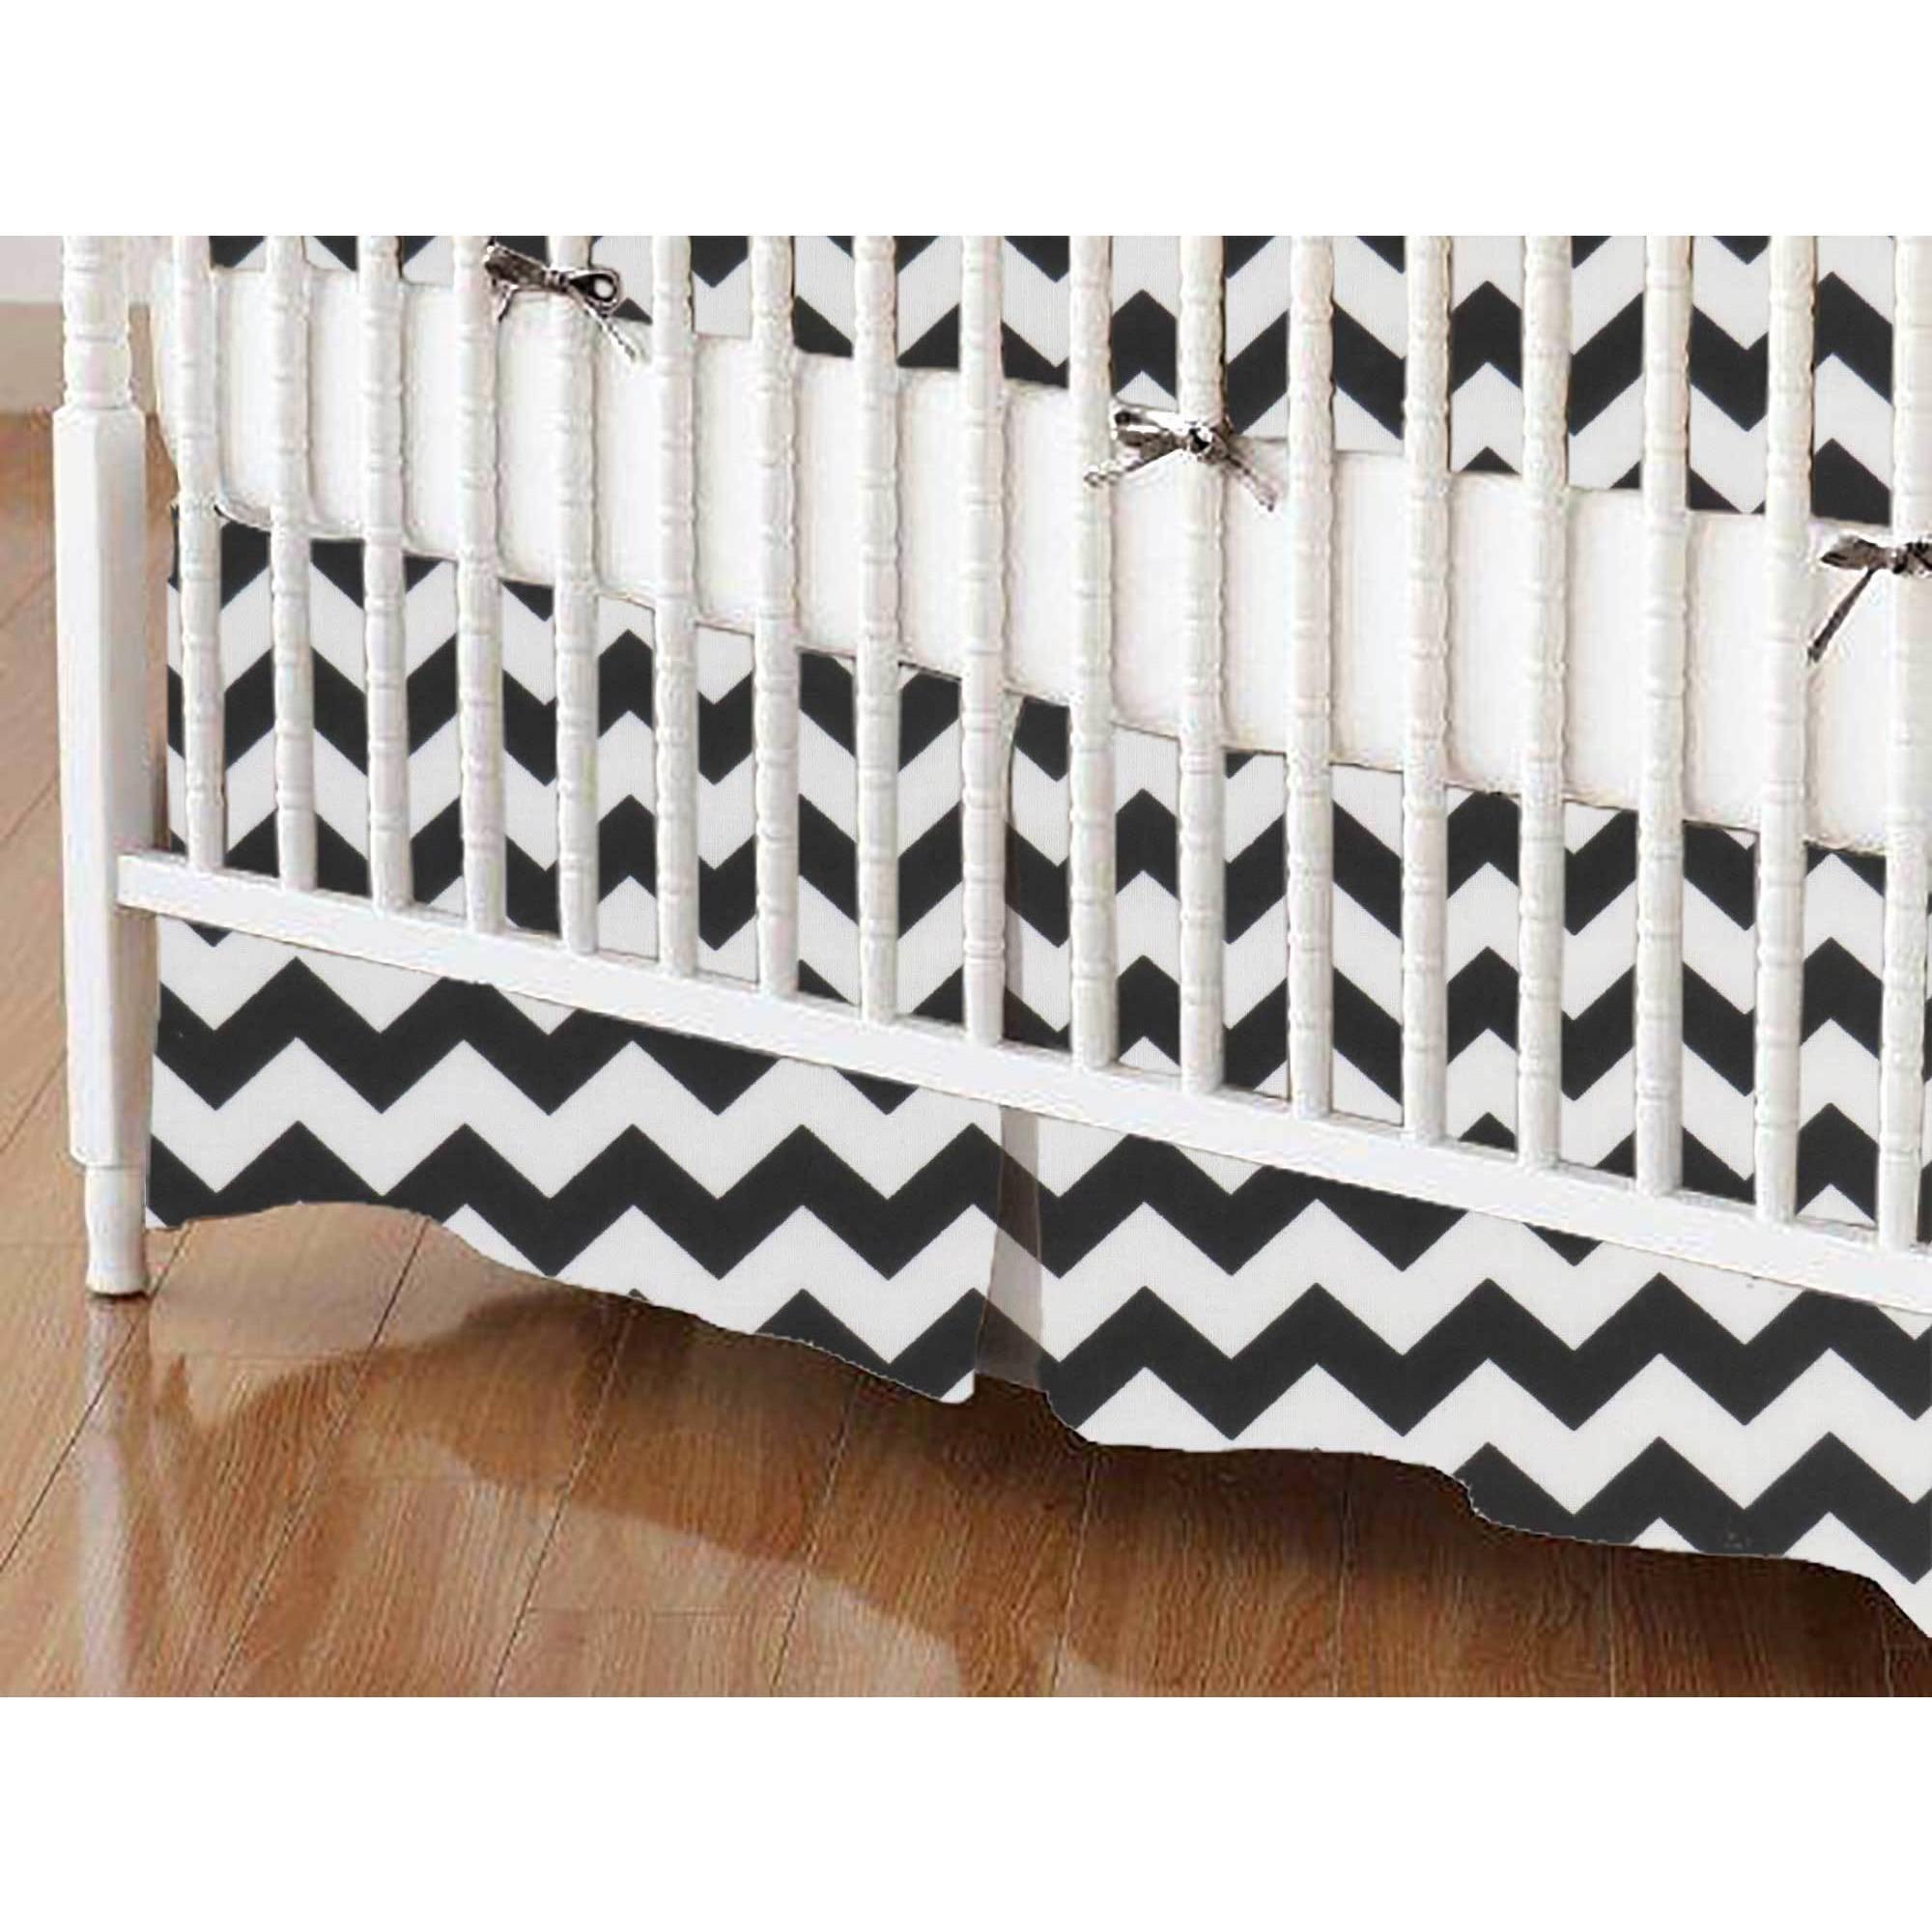 SheetWorld Crib Skirt - Black Chevron Zigzag